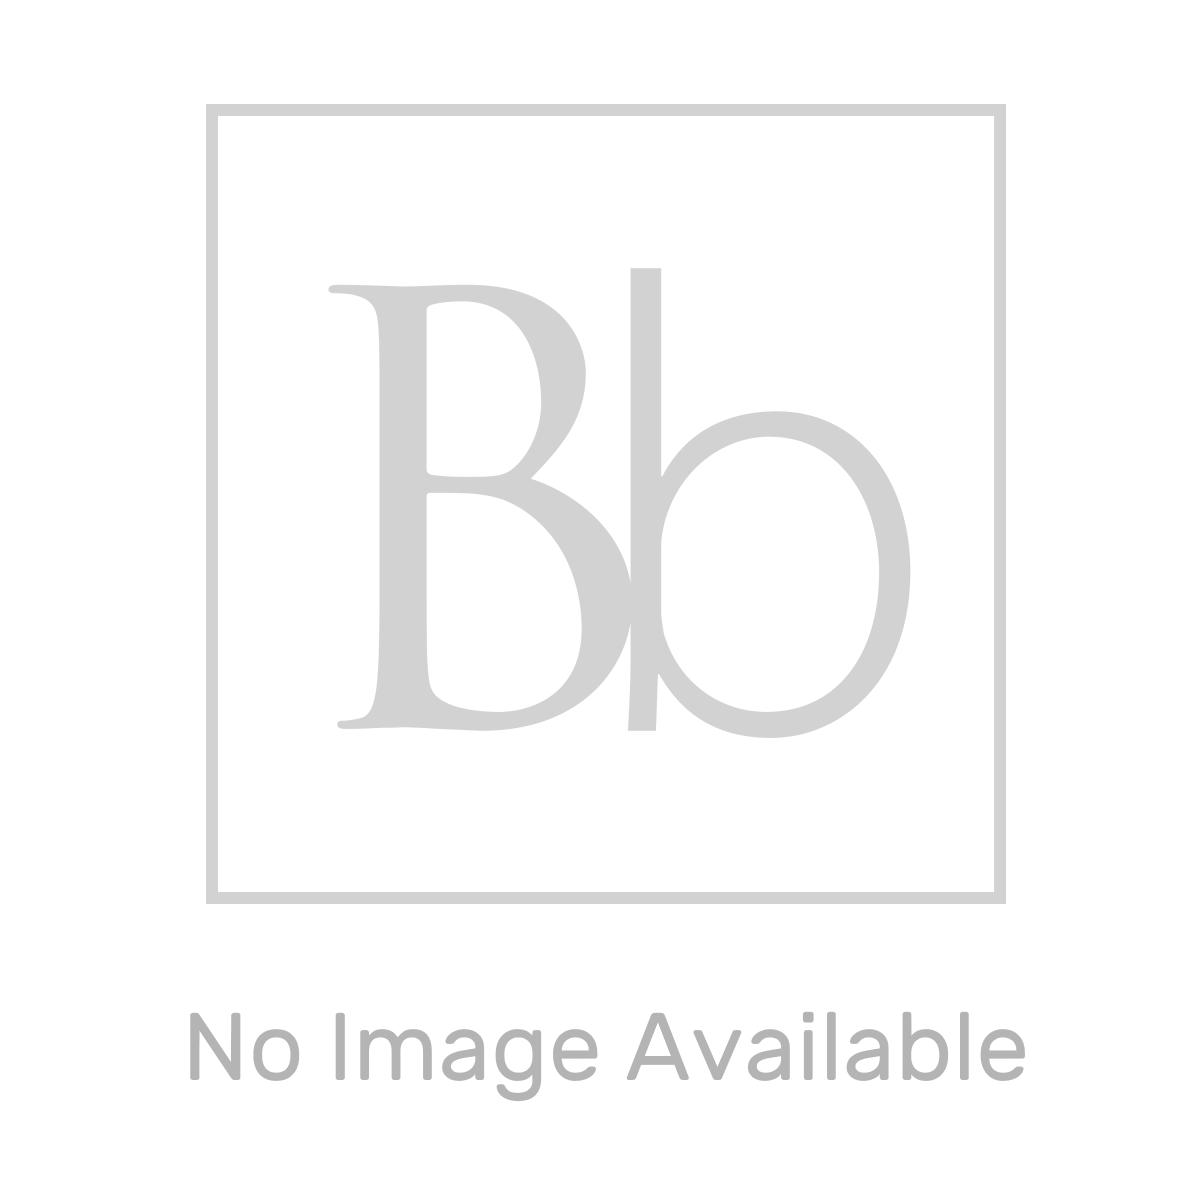 Frontline Standard Rectanglular Shower Tray 1500 x 760mm